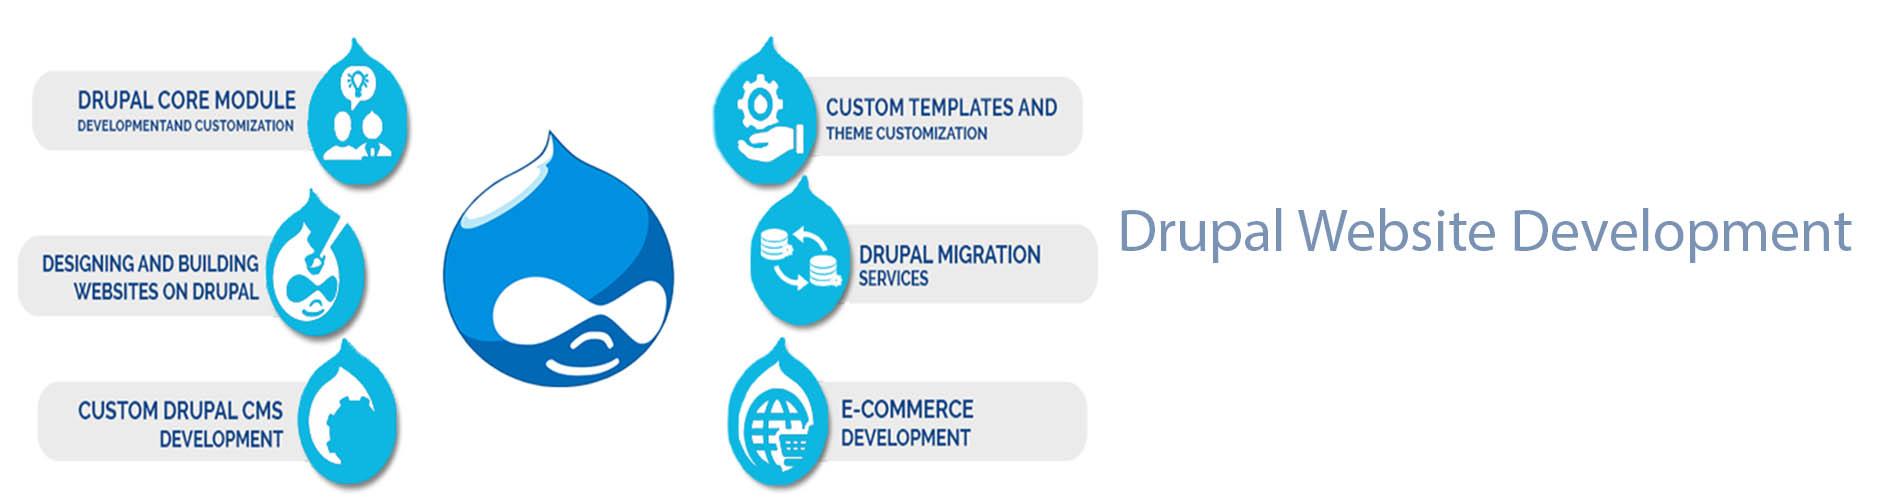 drupal-websitedevelopment-company